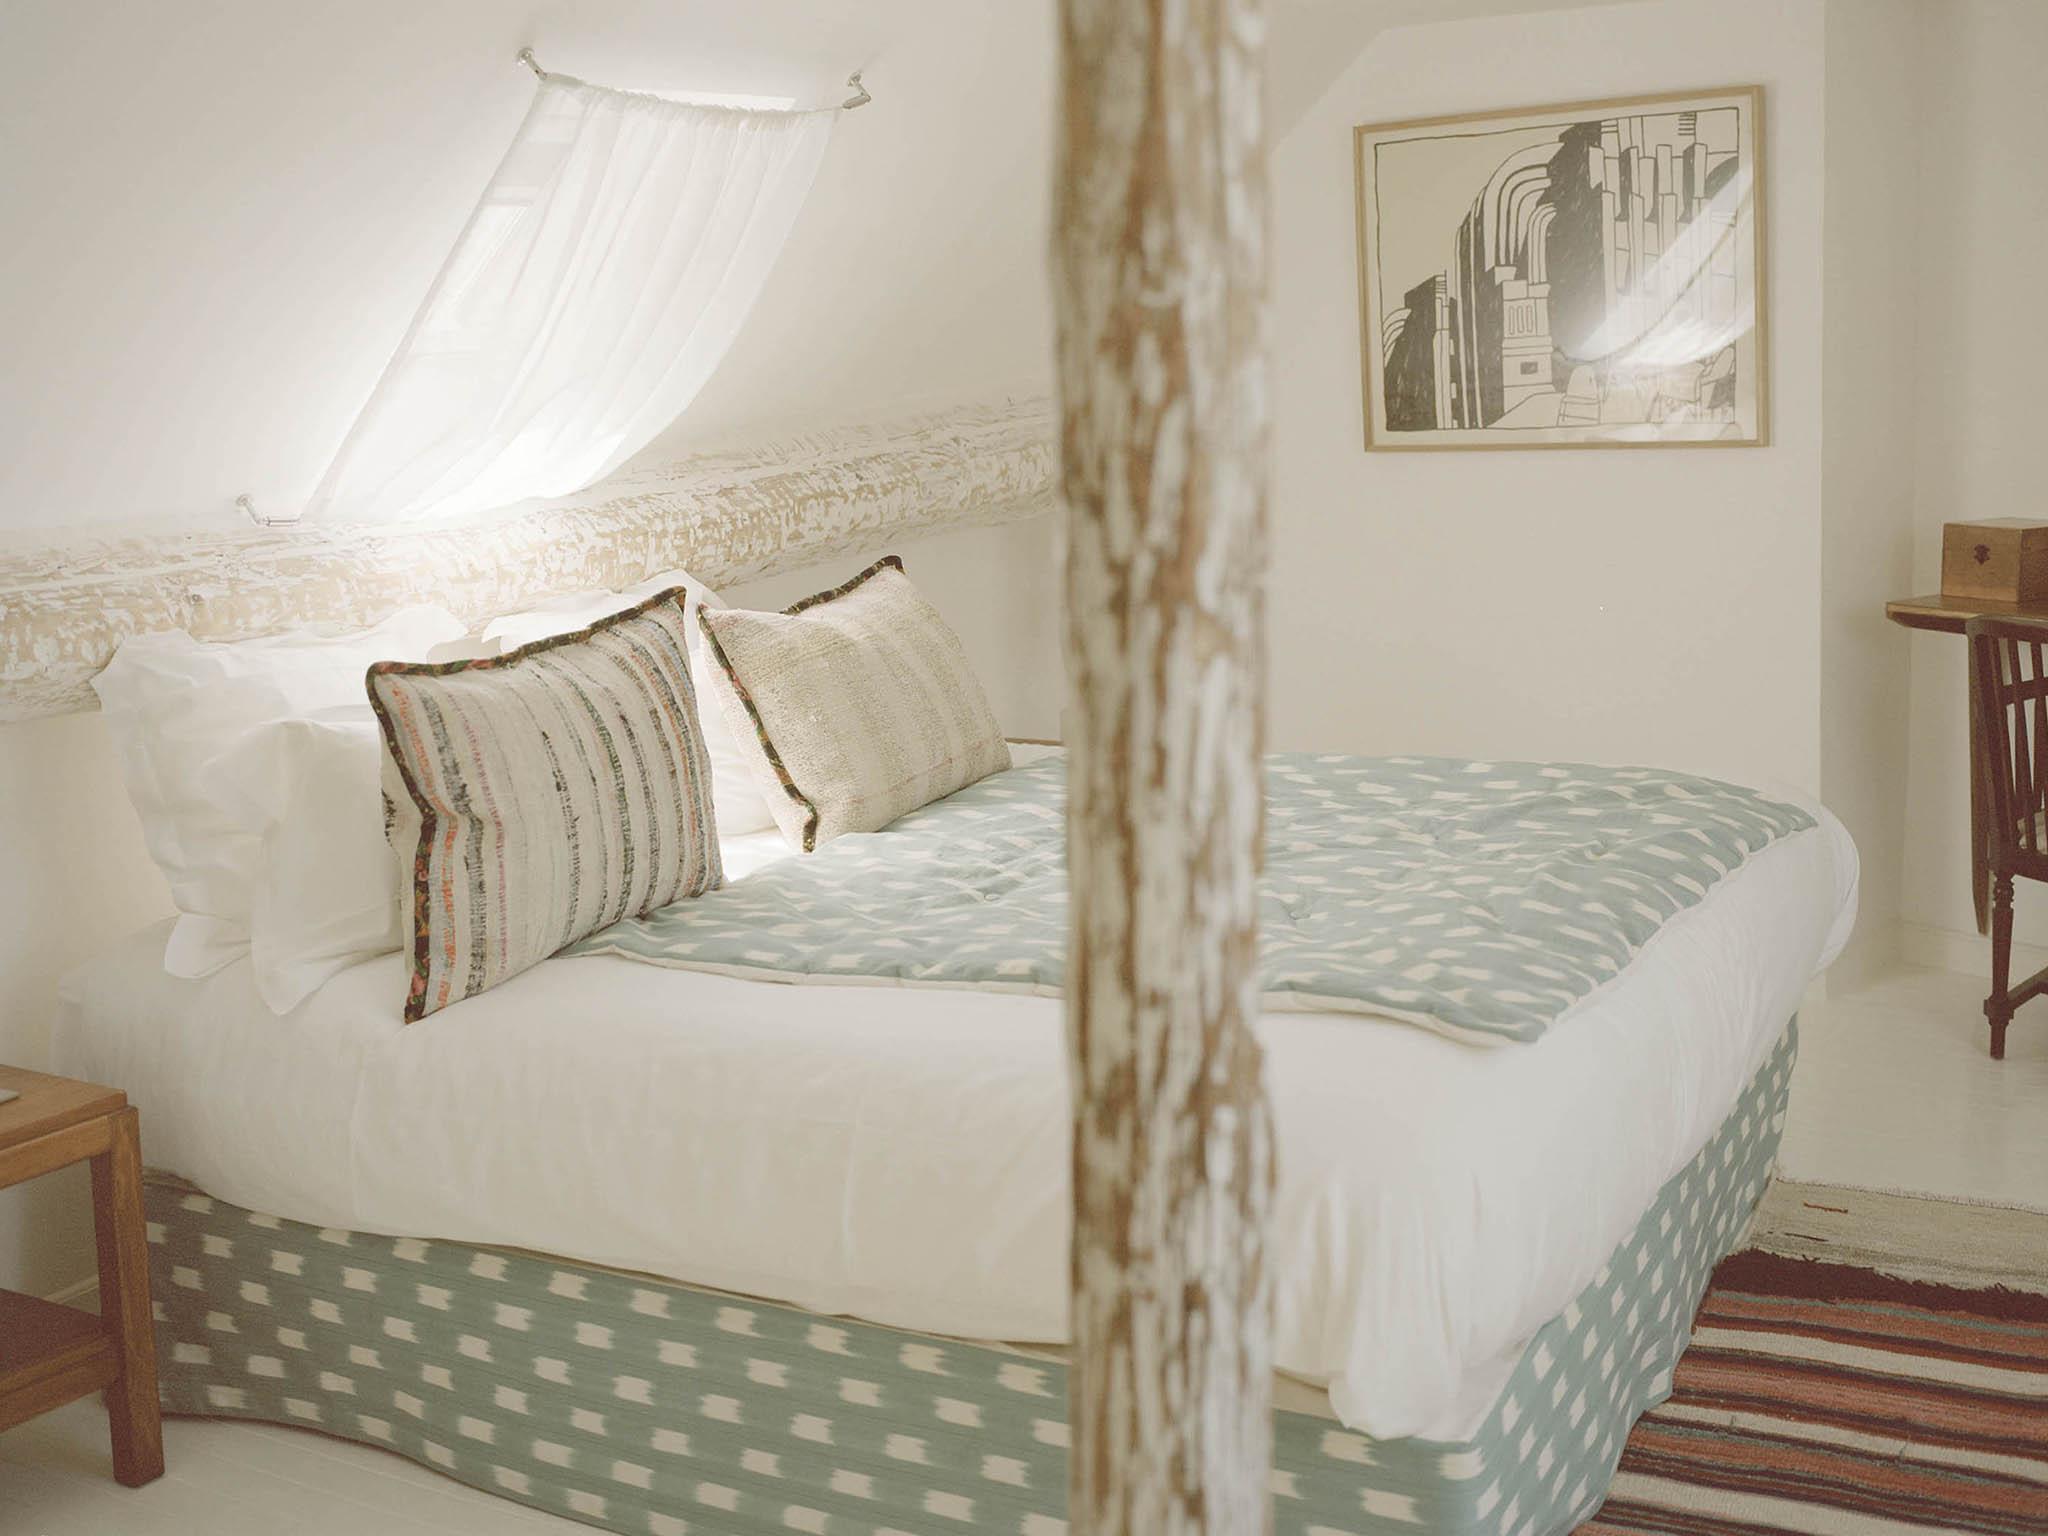 hotel in paris hotel du temps. Black Bedroom Furniture Sets. Home Design Ideas